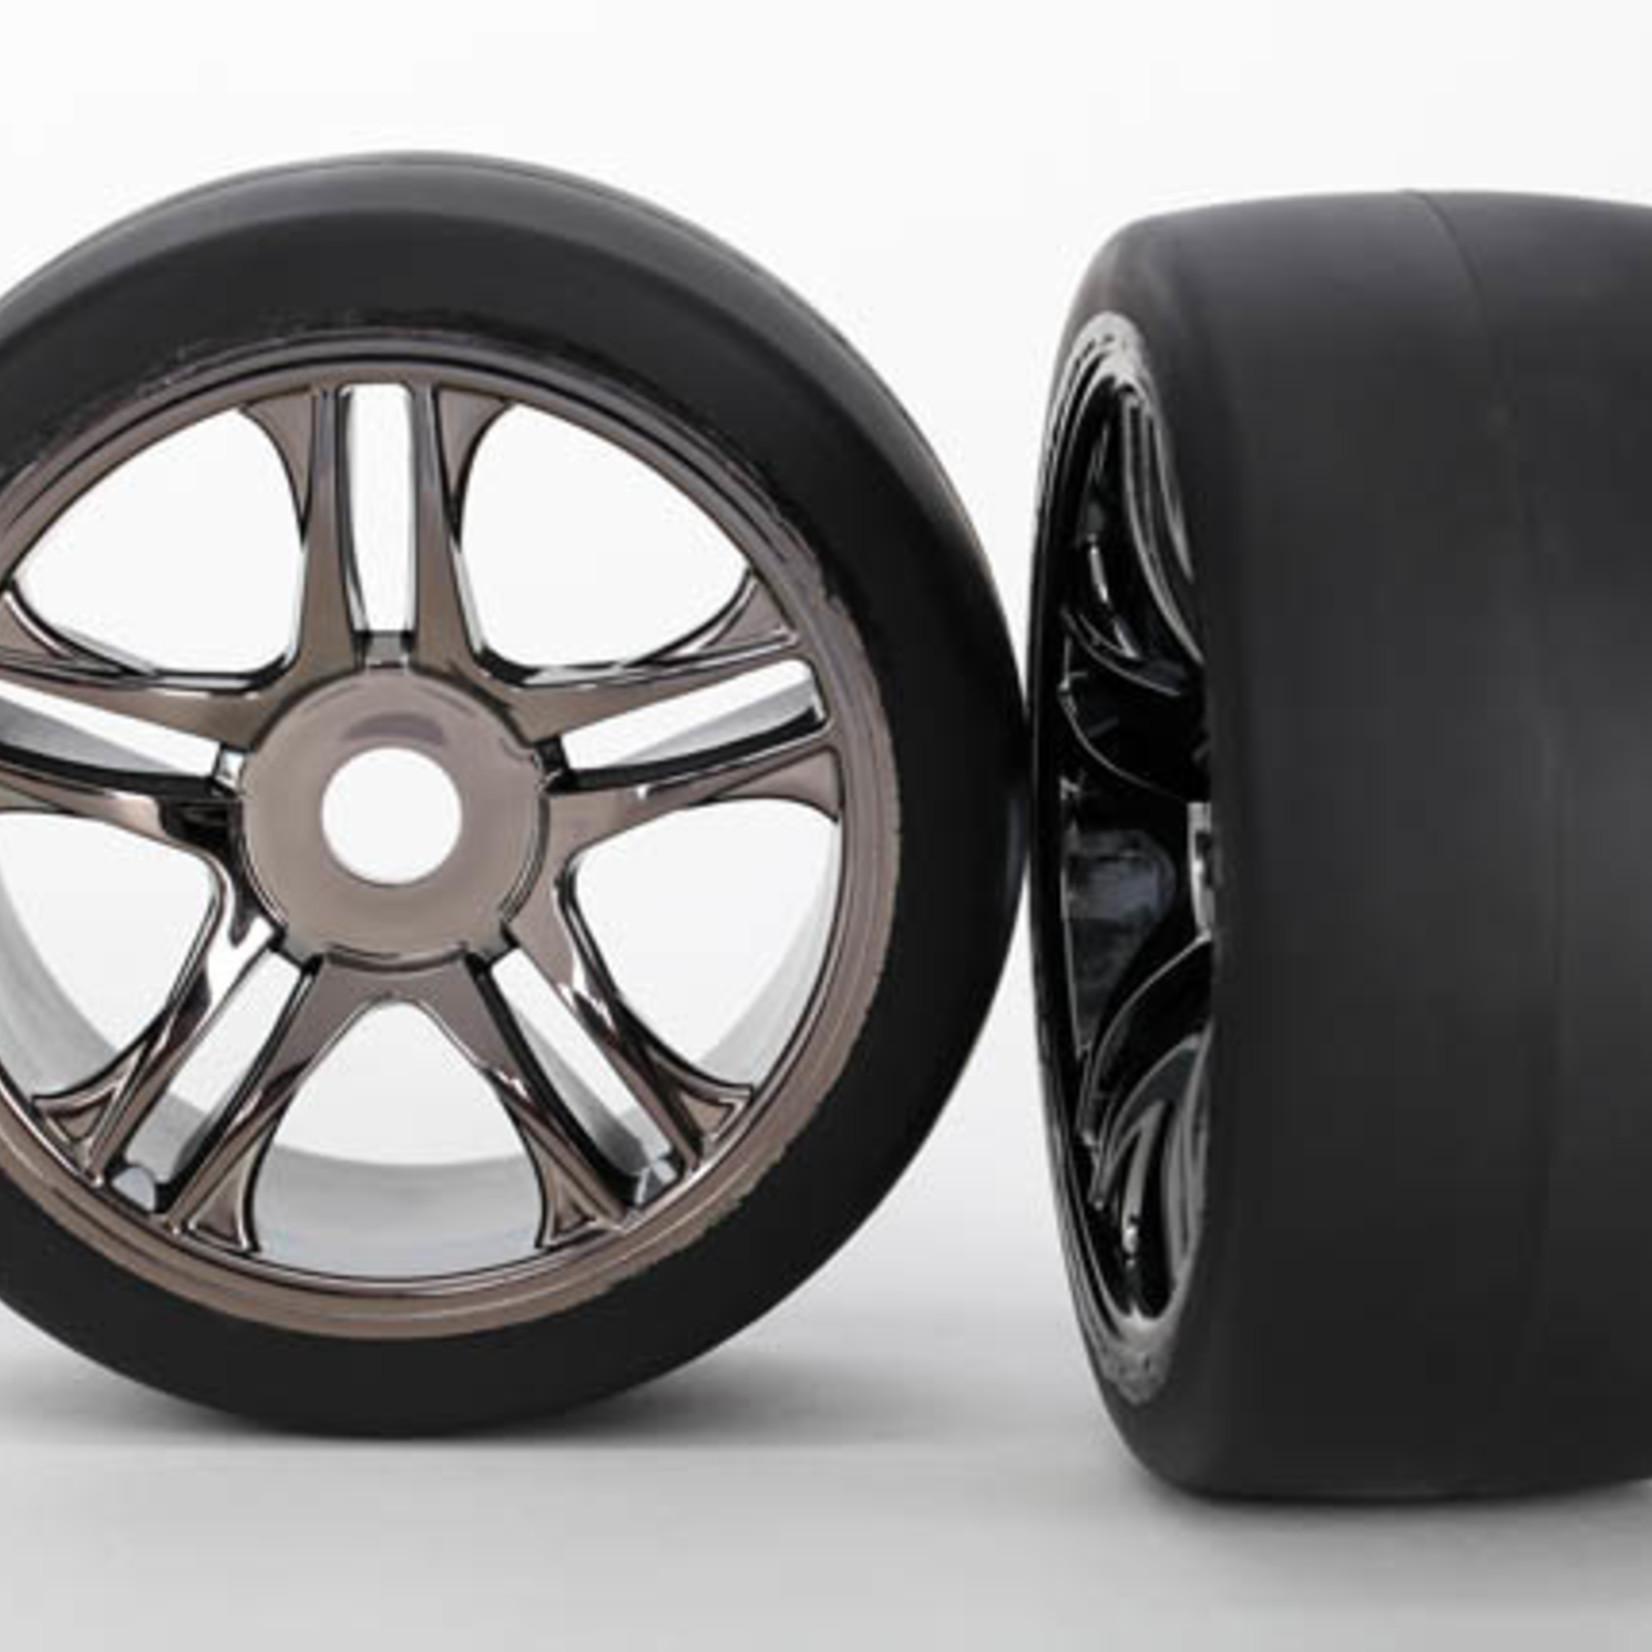 Traxxas TRA6479 Traxxas Tires & Wheels, Assembled, Glued (Split-Spoke, Black Chrome Wheels, Slick Tires (S1 Compound), Foam Inserts) (Front) (2)